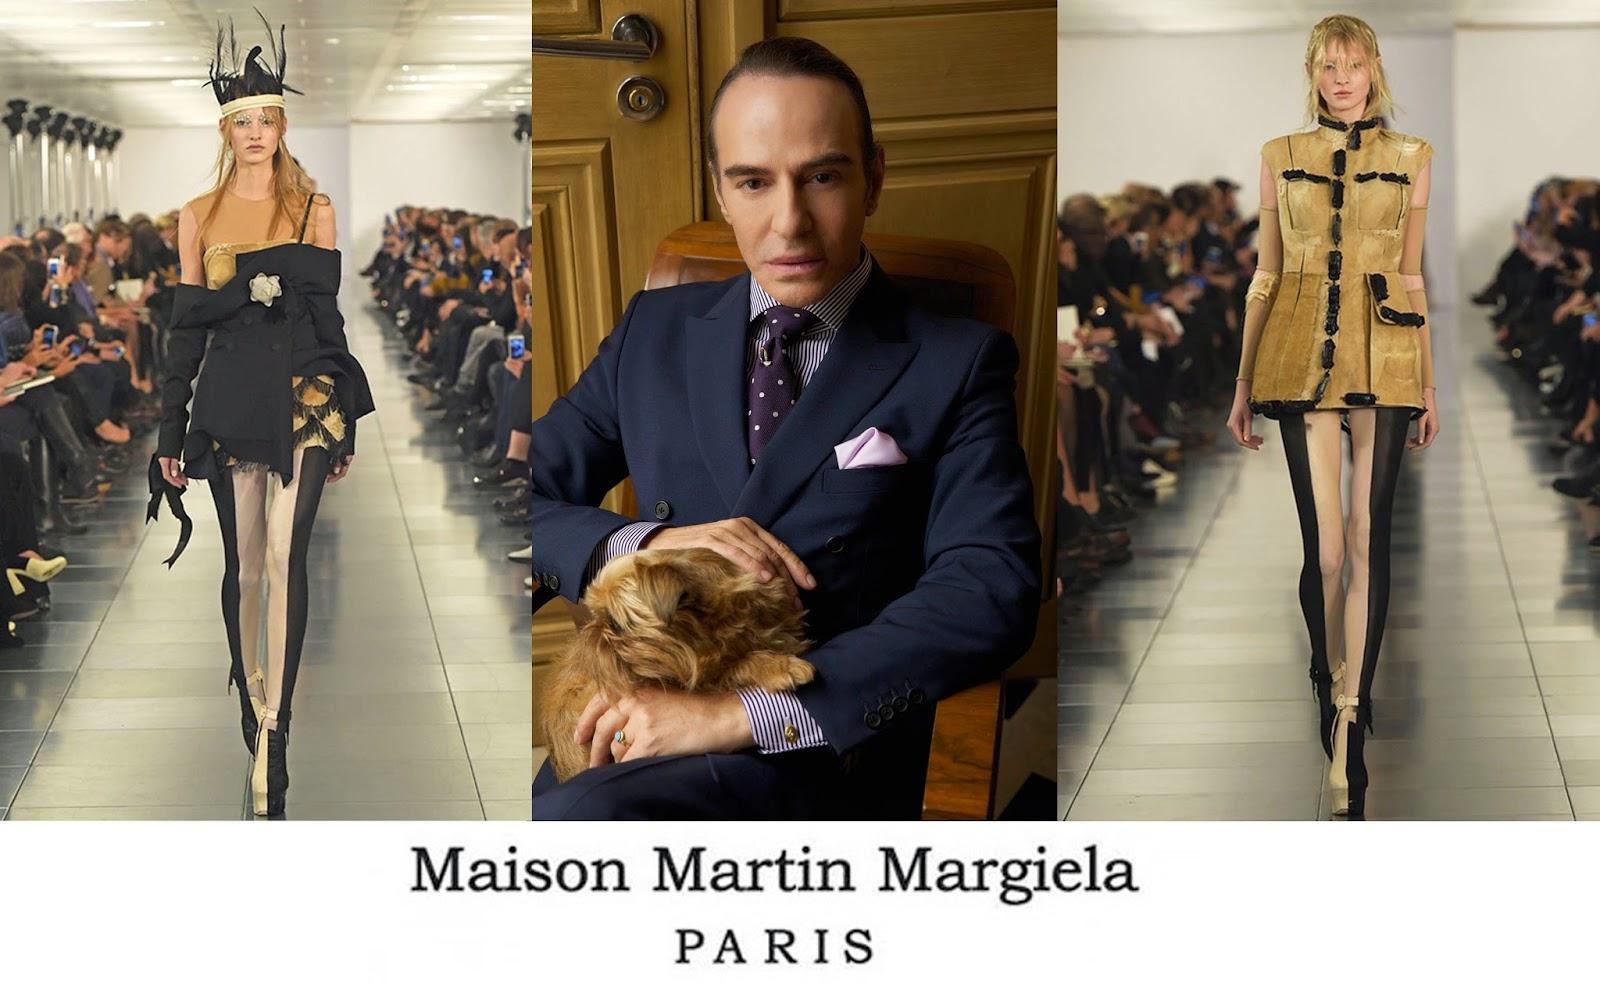 Eniwhere Fashion - John Galliano return with Maison Martin Margiela